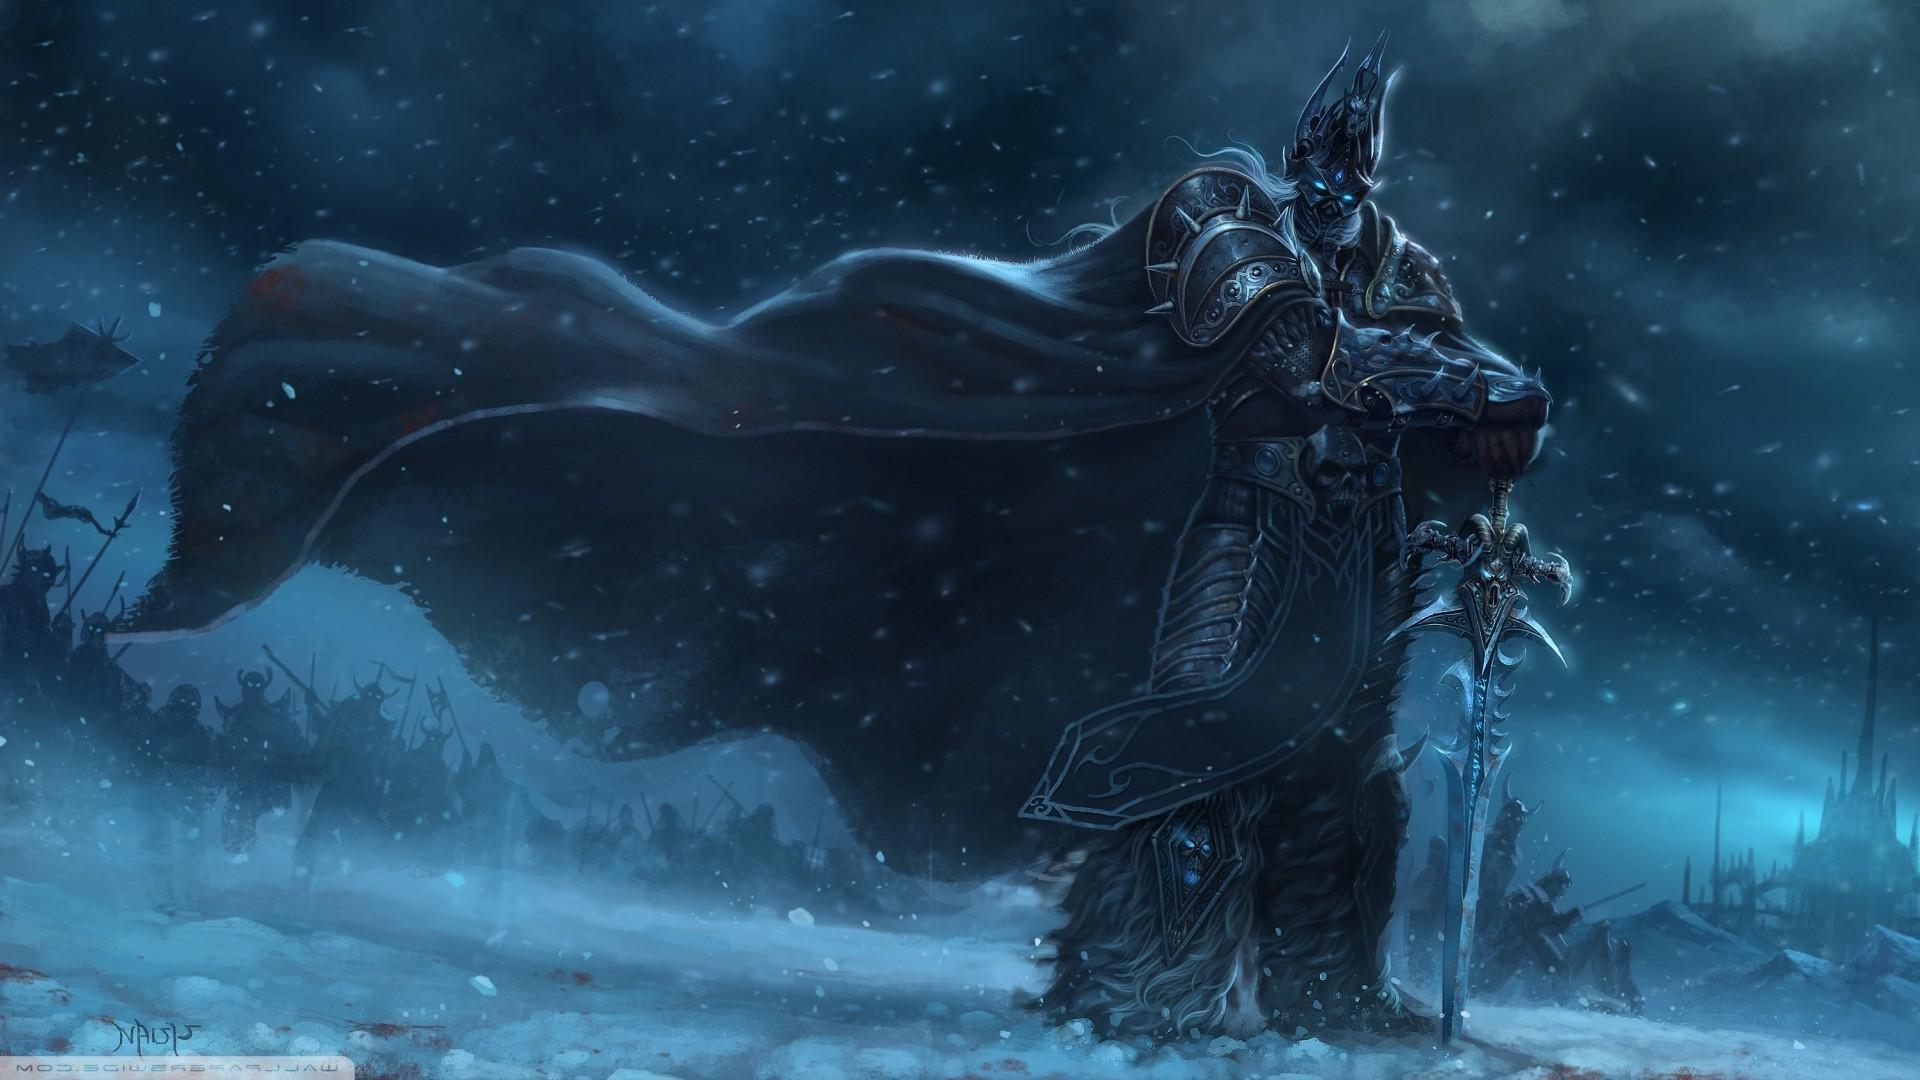 World Of Warcraft Backgrounds 1920x1080: Arthas Wallpaper (76+ Images